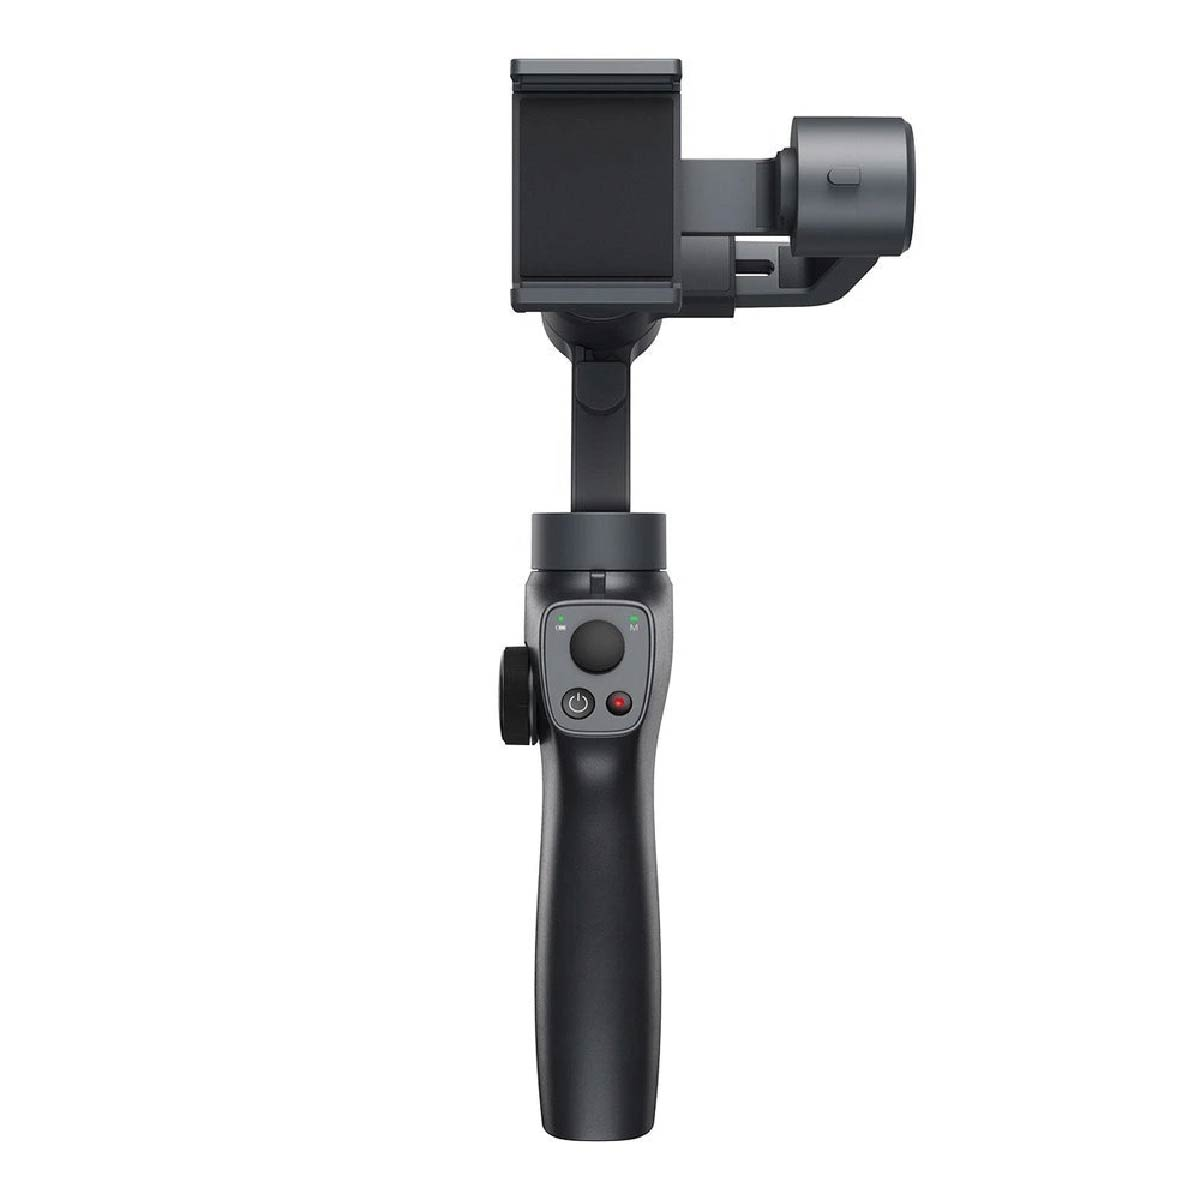 Estabilizador Baseus Para Smartphone Handheld Gimbal